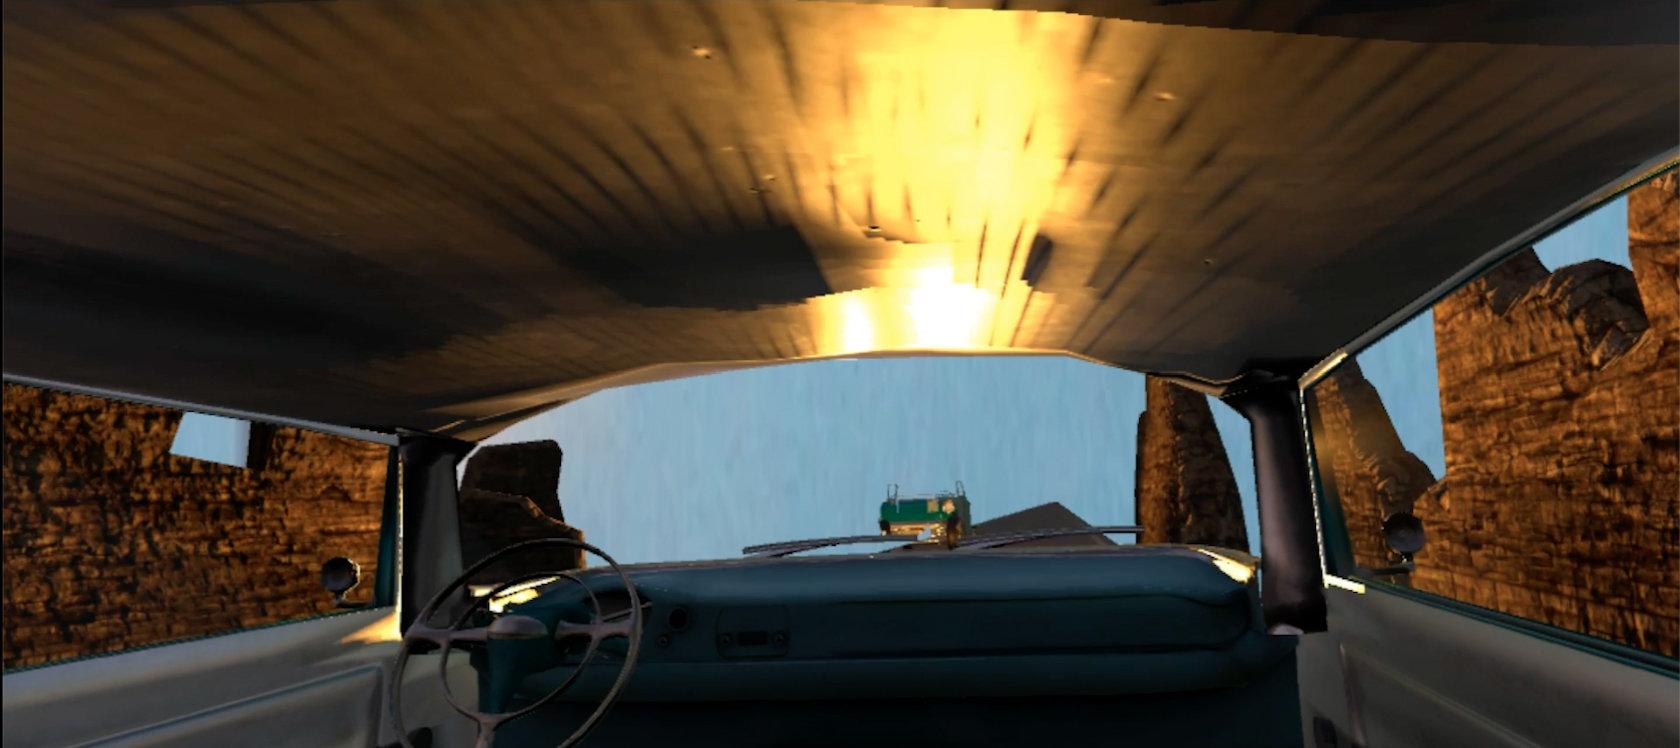 The Trip, 2020 (Window capture)